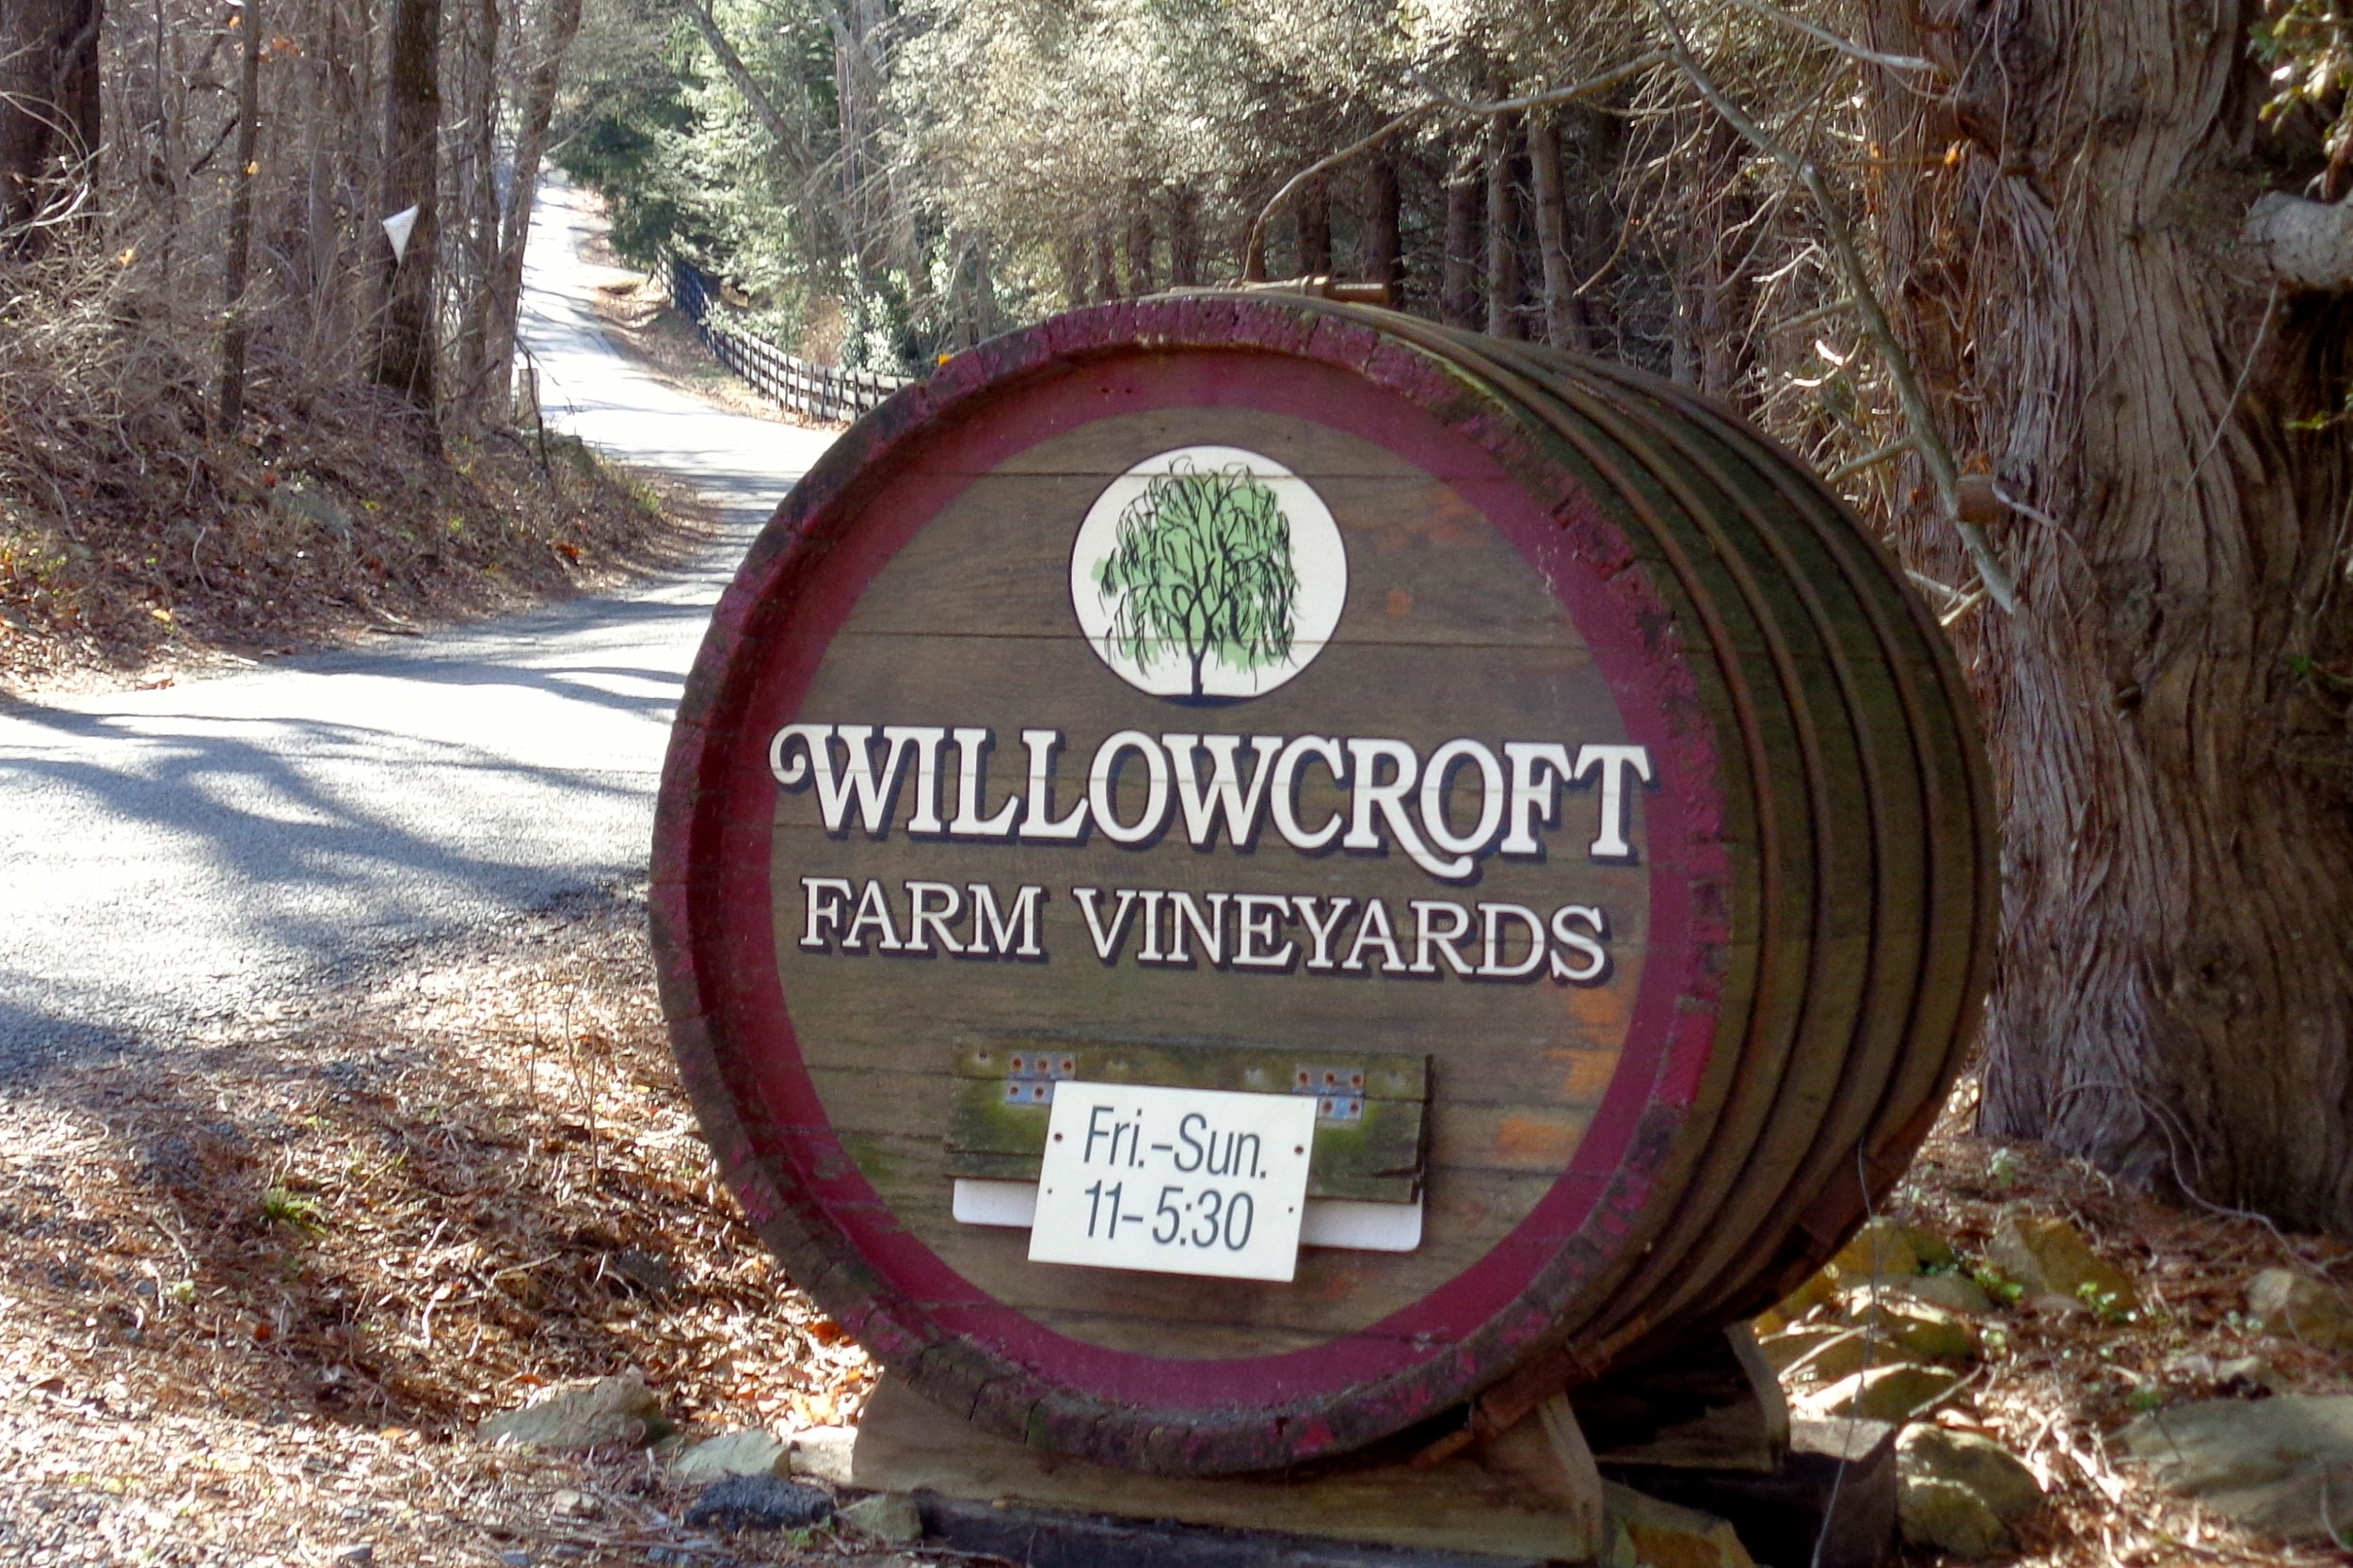 Willowcroft Farm Vineyards